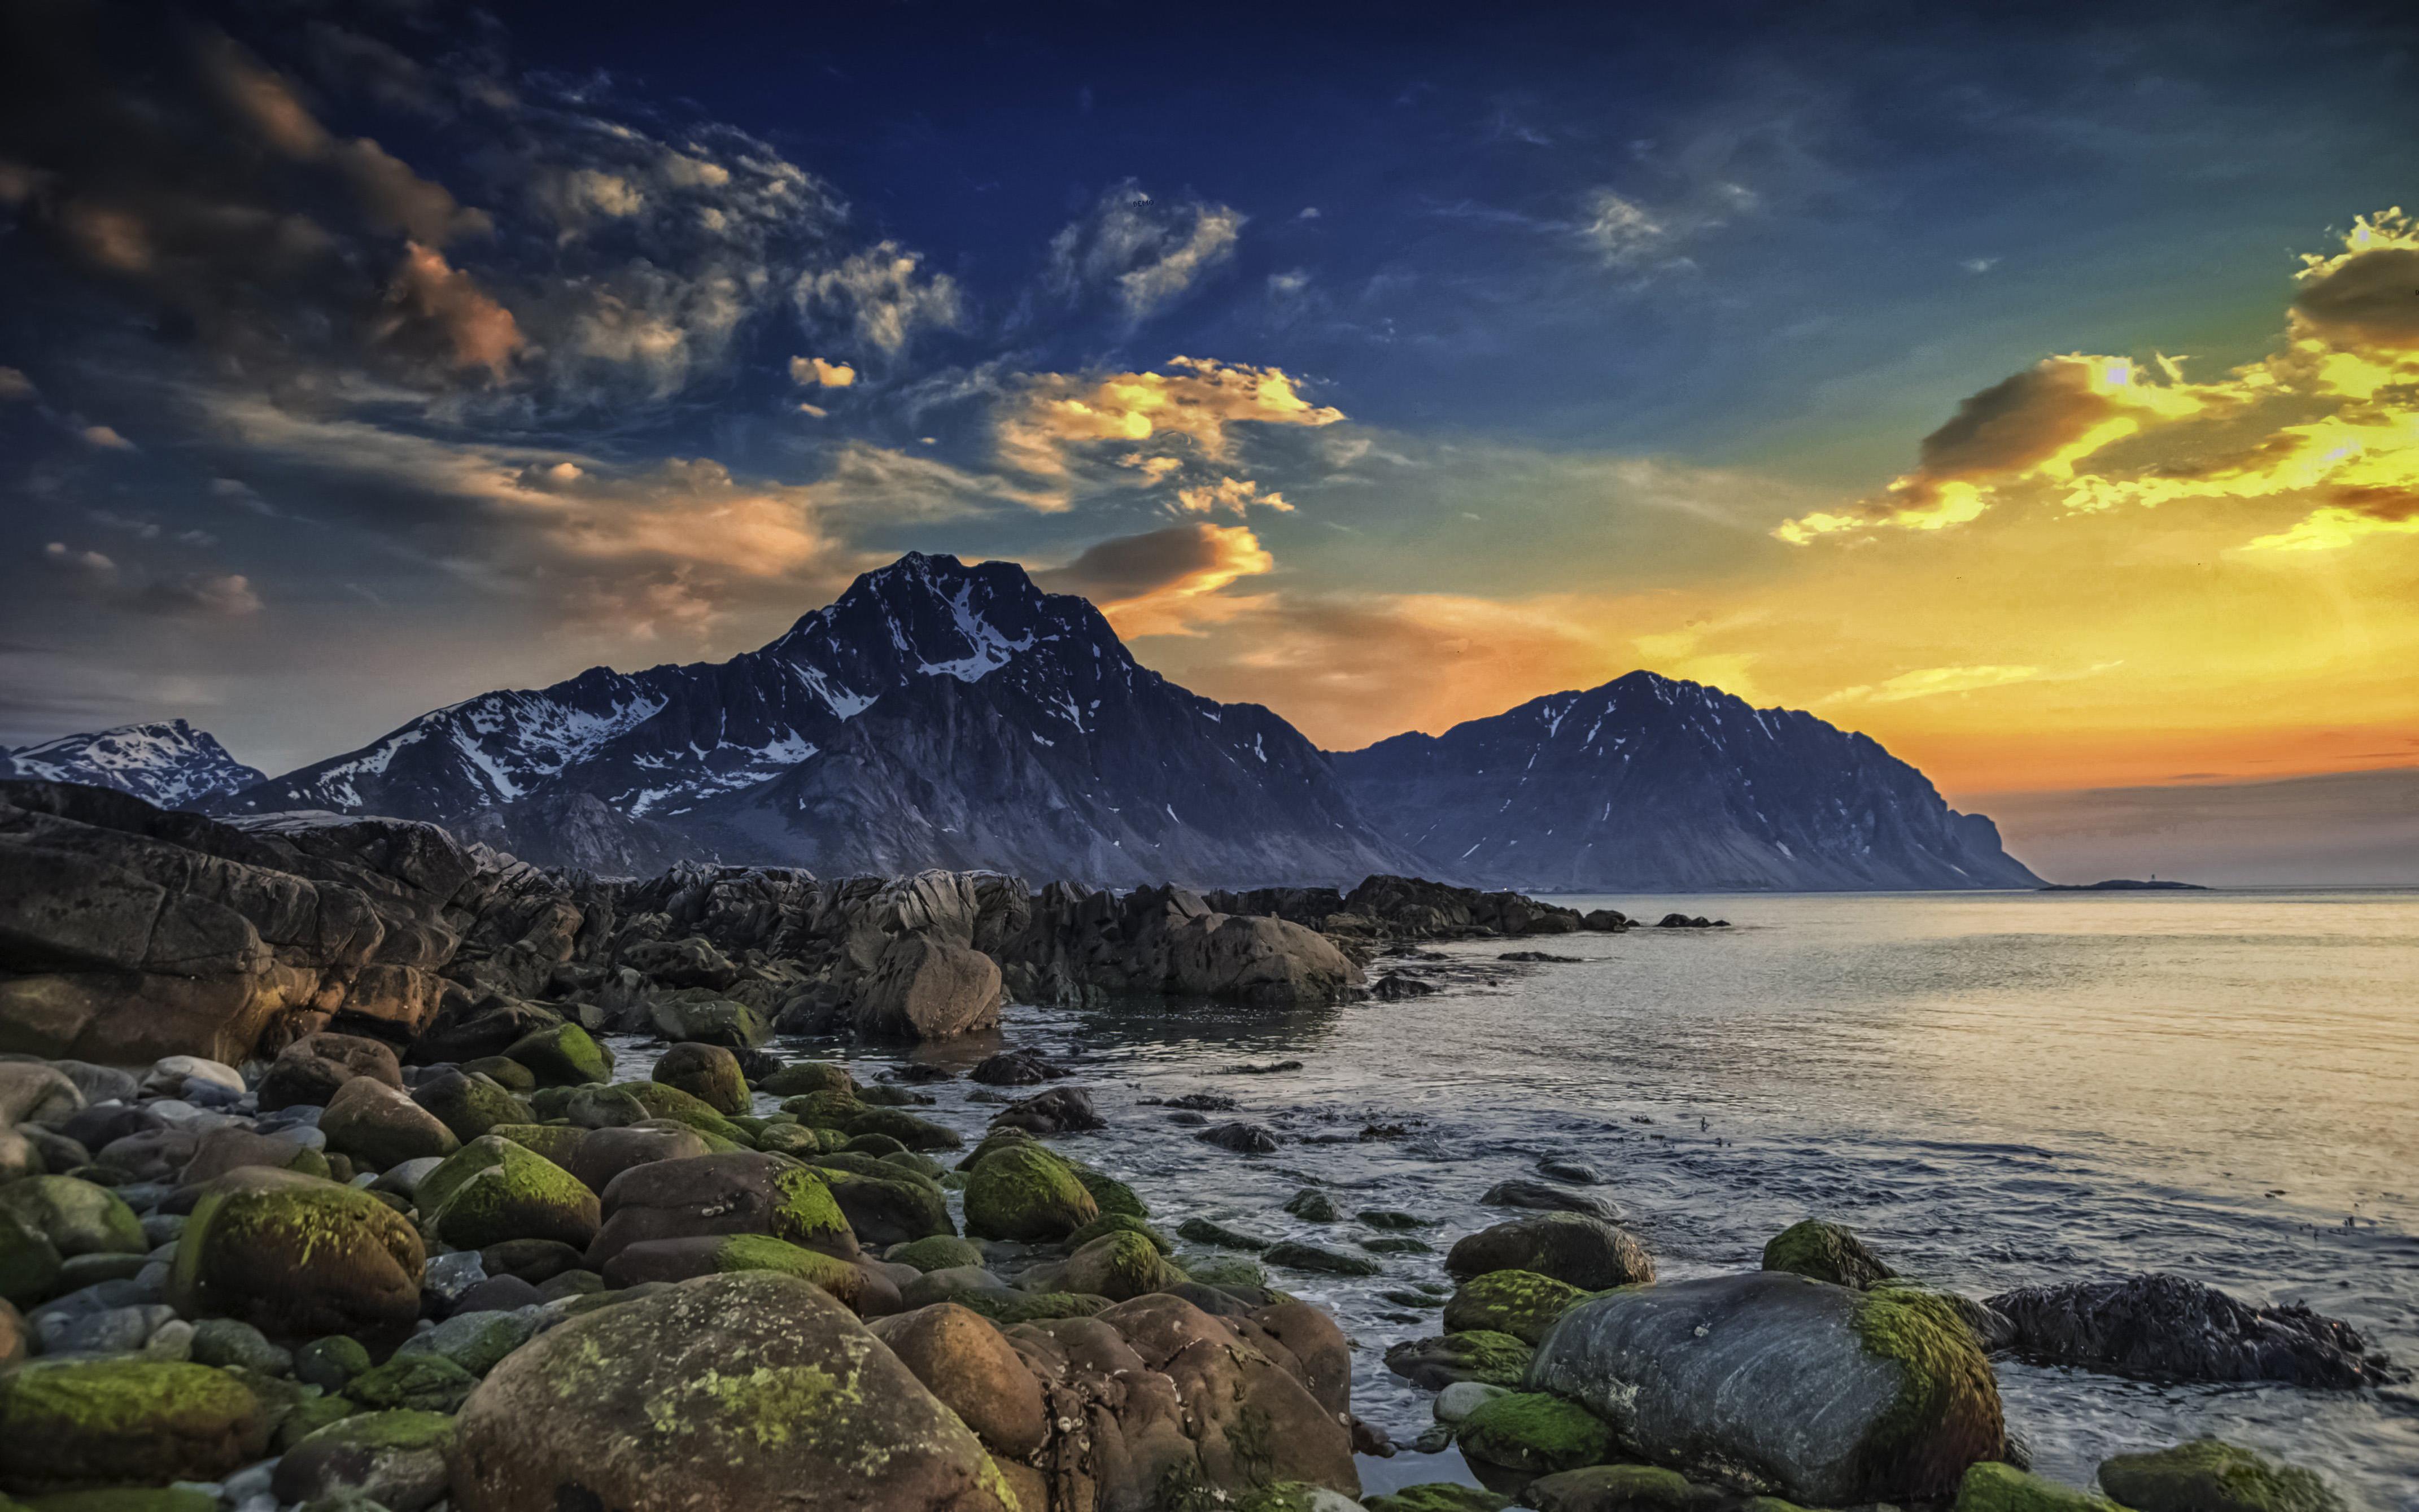 3d Christmas Live Wallpaper For Windows Spring Sea Islands Lofoten Mountain Boulders Seashore Sky